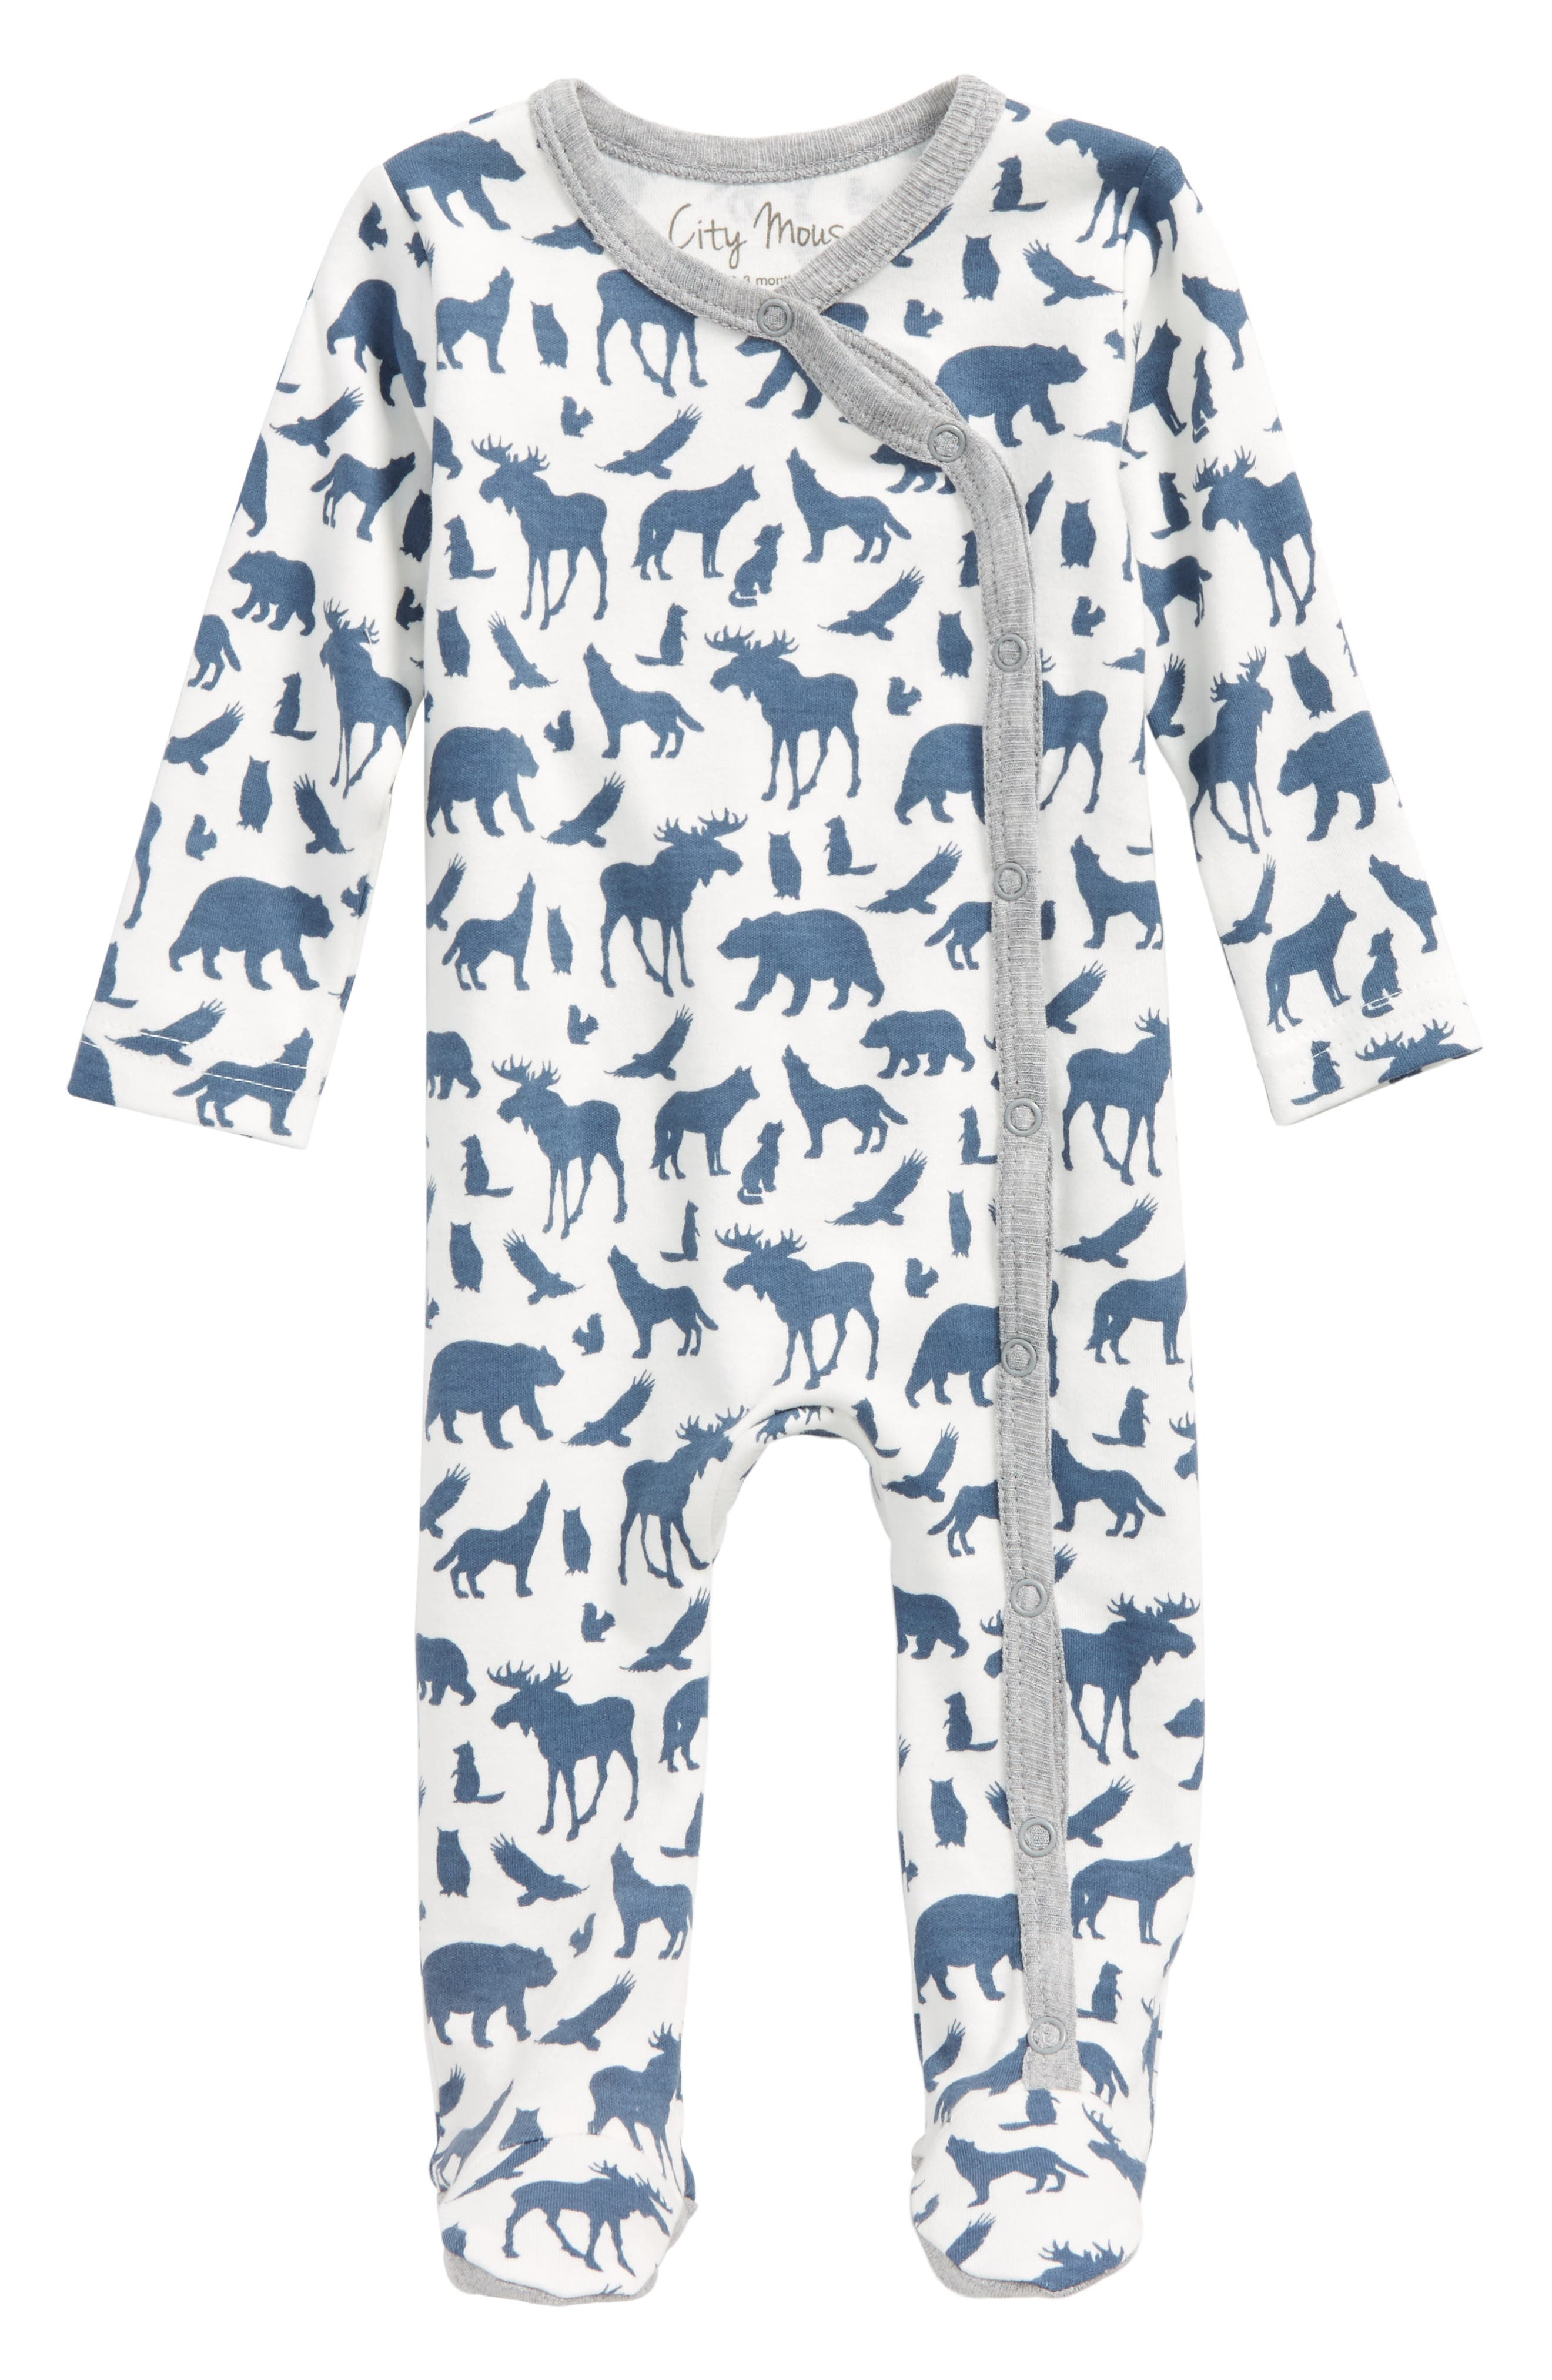 Animal Print Organic Cotton Footie,                             Main thumbnail 1, color,                             Off White / Blue